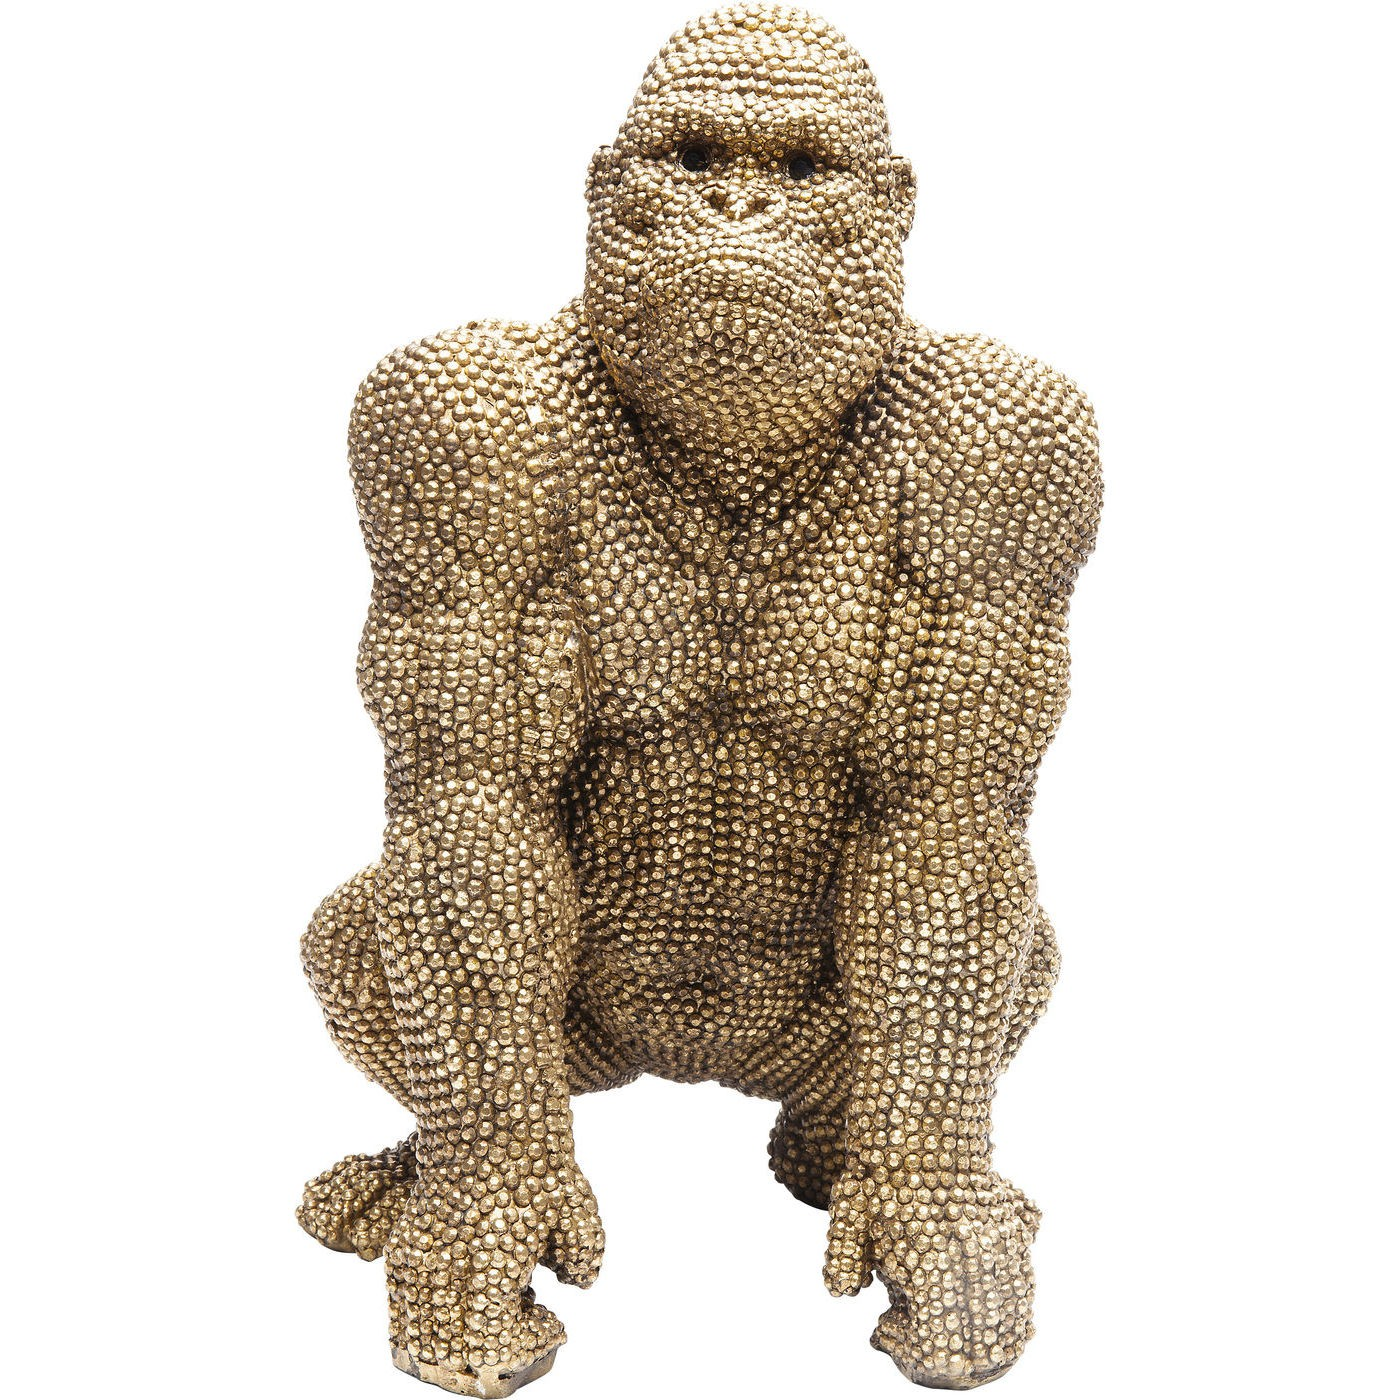 Statuette gorille strass en polyrésine dorée H46